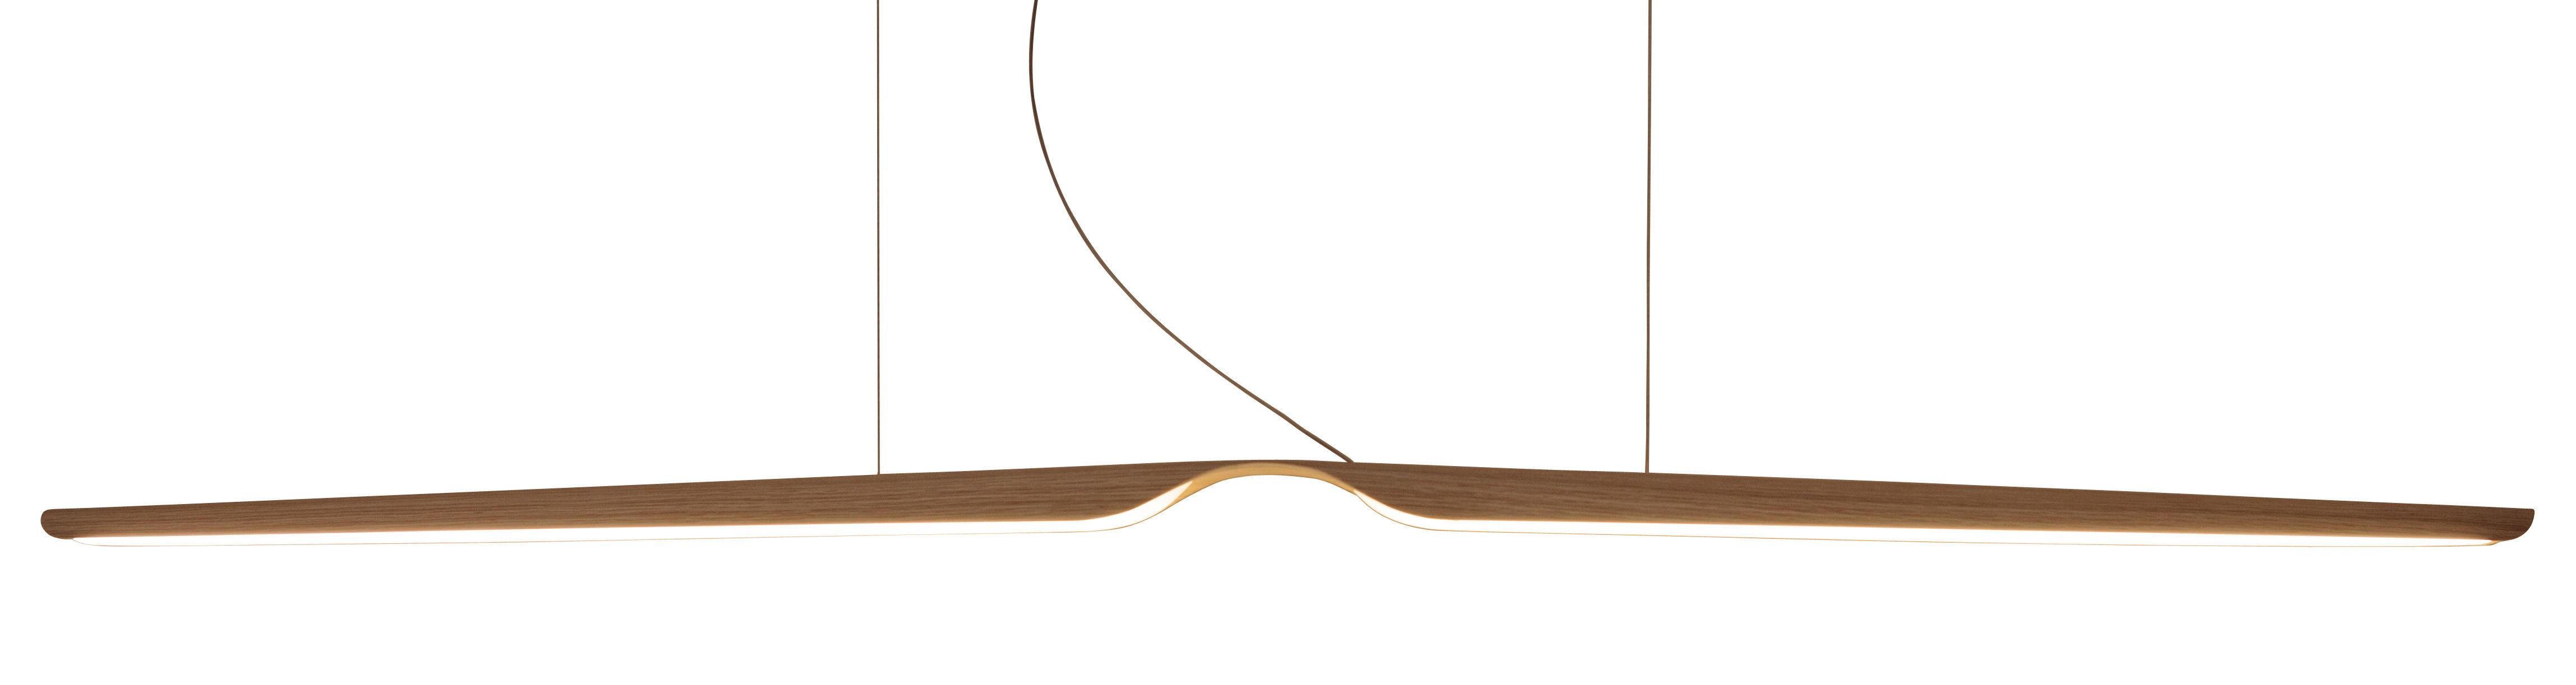 Luminaire - Suspensions - Suspension Swan / L 162 cm - Tunto - Chêne - Chêne